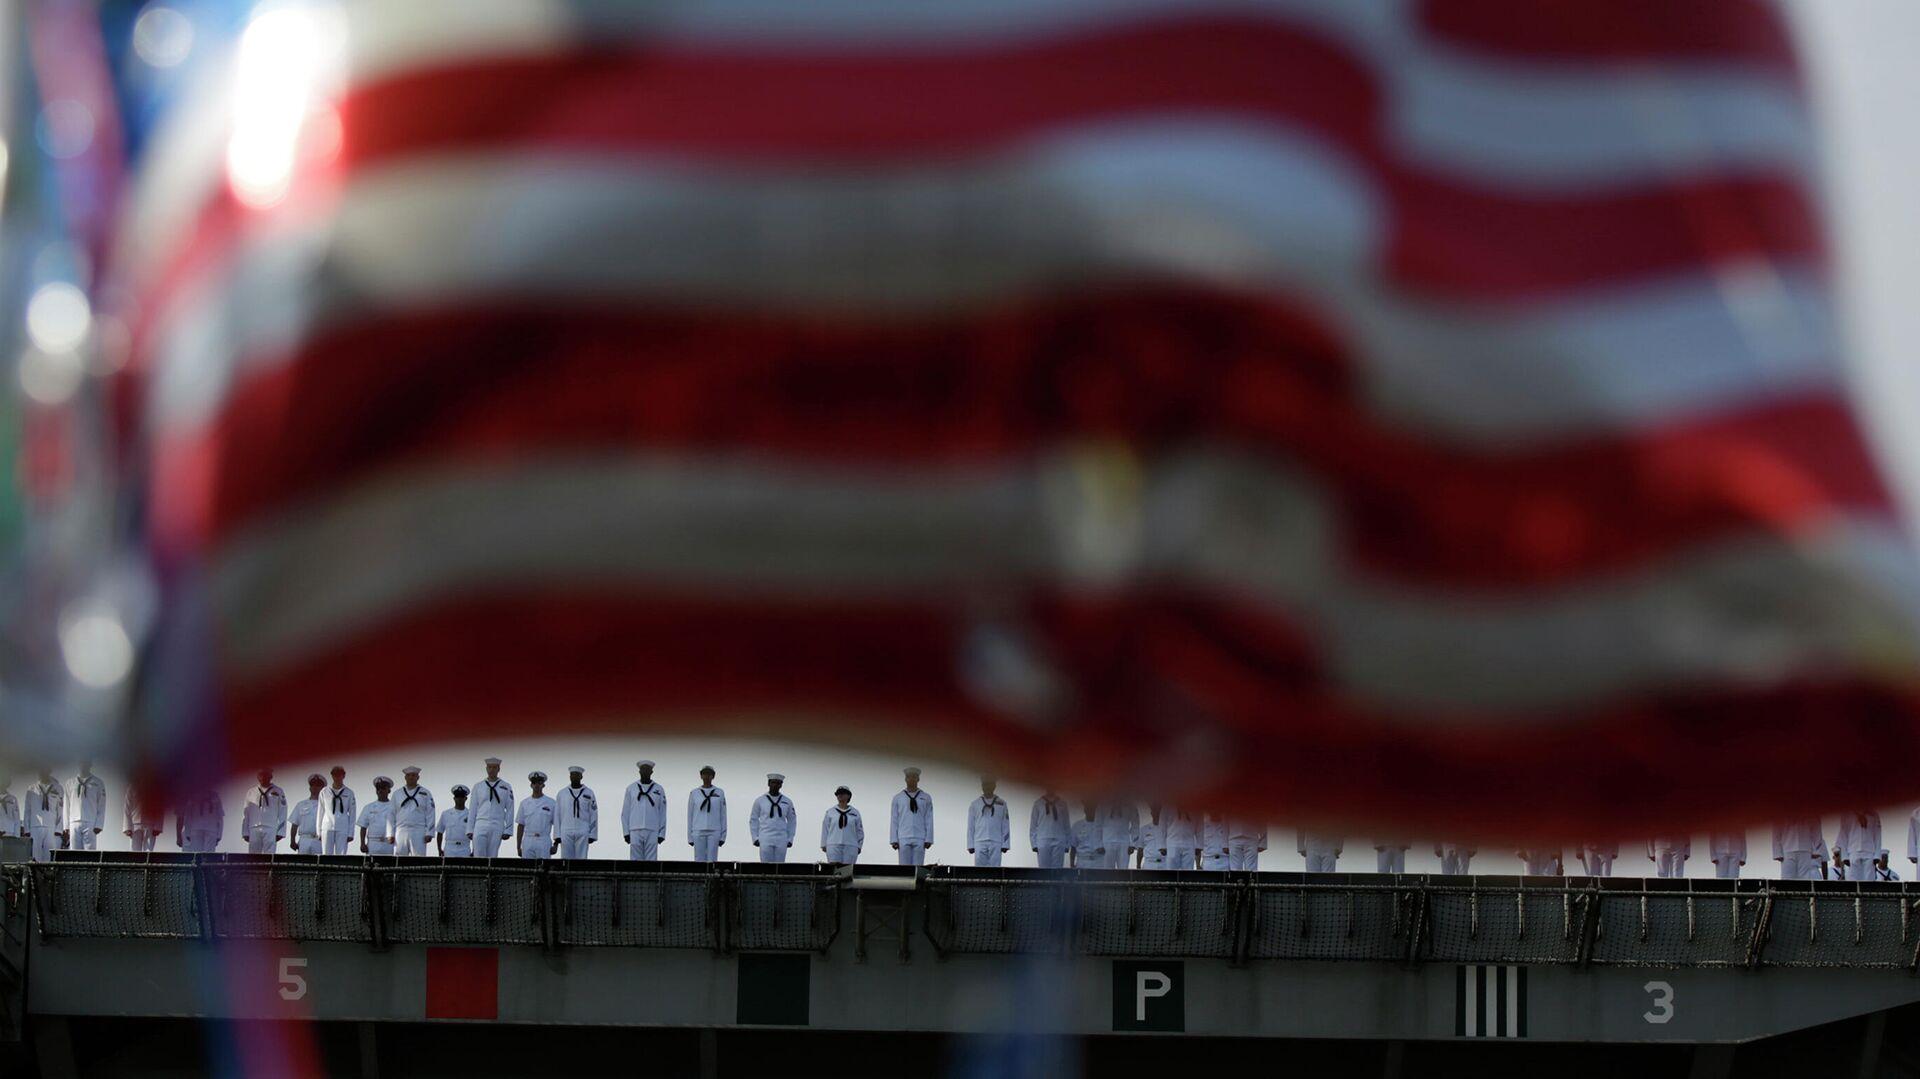 Команда авианосца Рональд Рейган ВМС США - РИА Новости, 1920, 12.01.2021